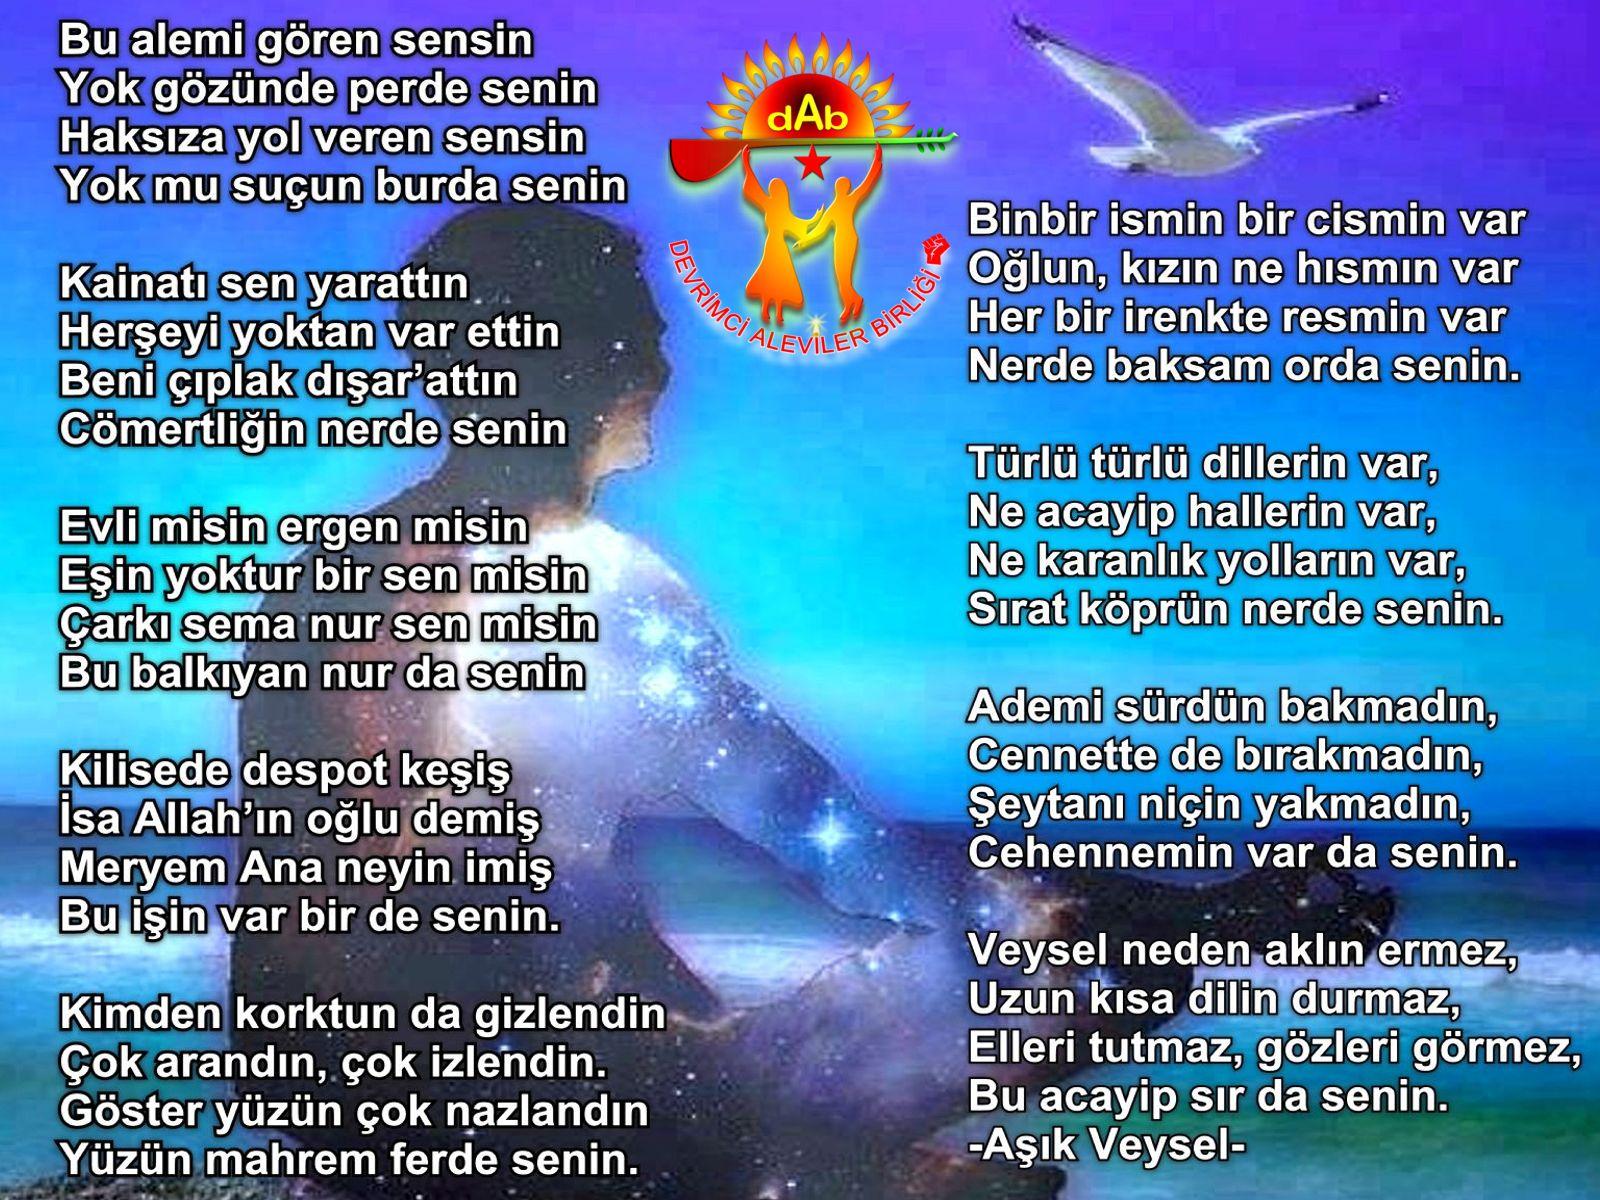 Alevi Bektaşi Kızılbaş Pir Sultan Devrimci Aleviler Birliği DAB dverimci Aleviler birlgi DAB veysel2